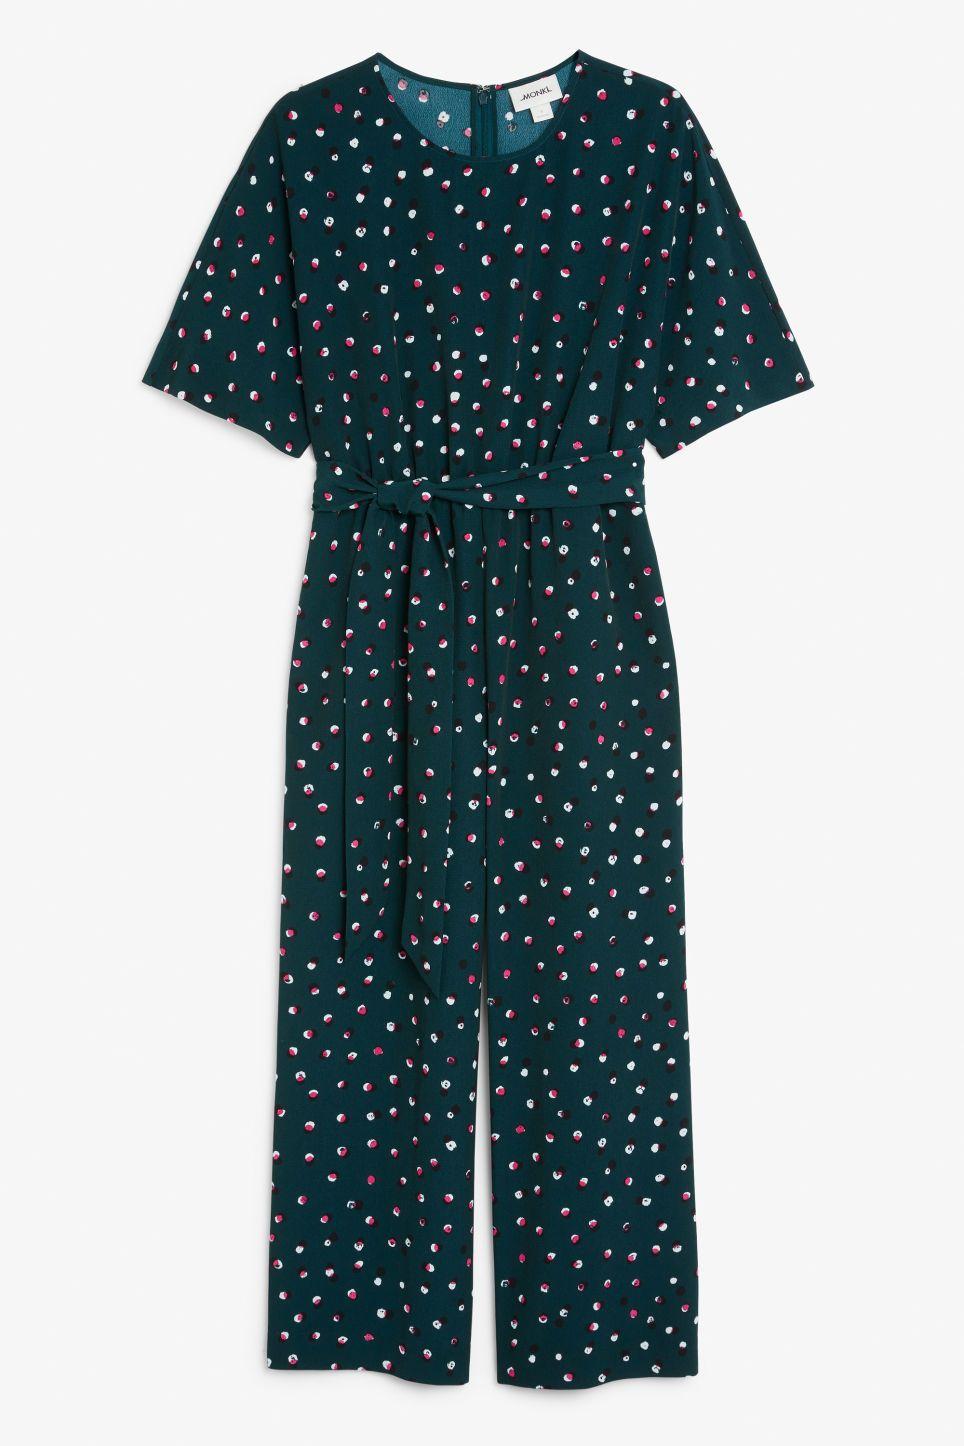 b1a7ccf0821 Belted jumpsuit - Multi-colour polka dot - Jumpsuits